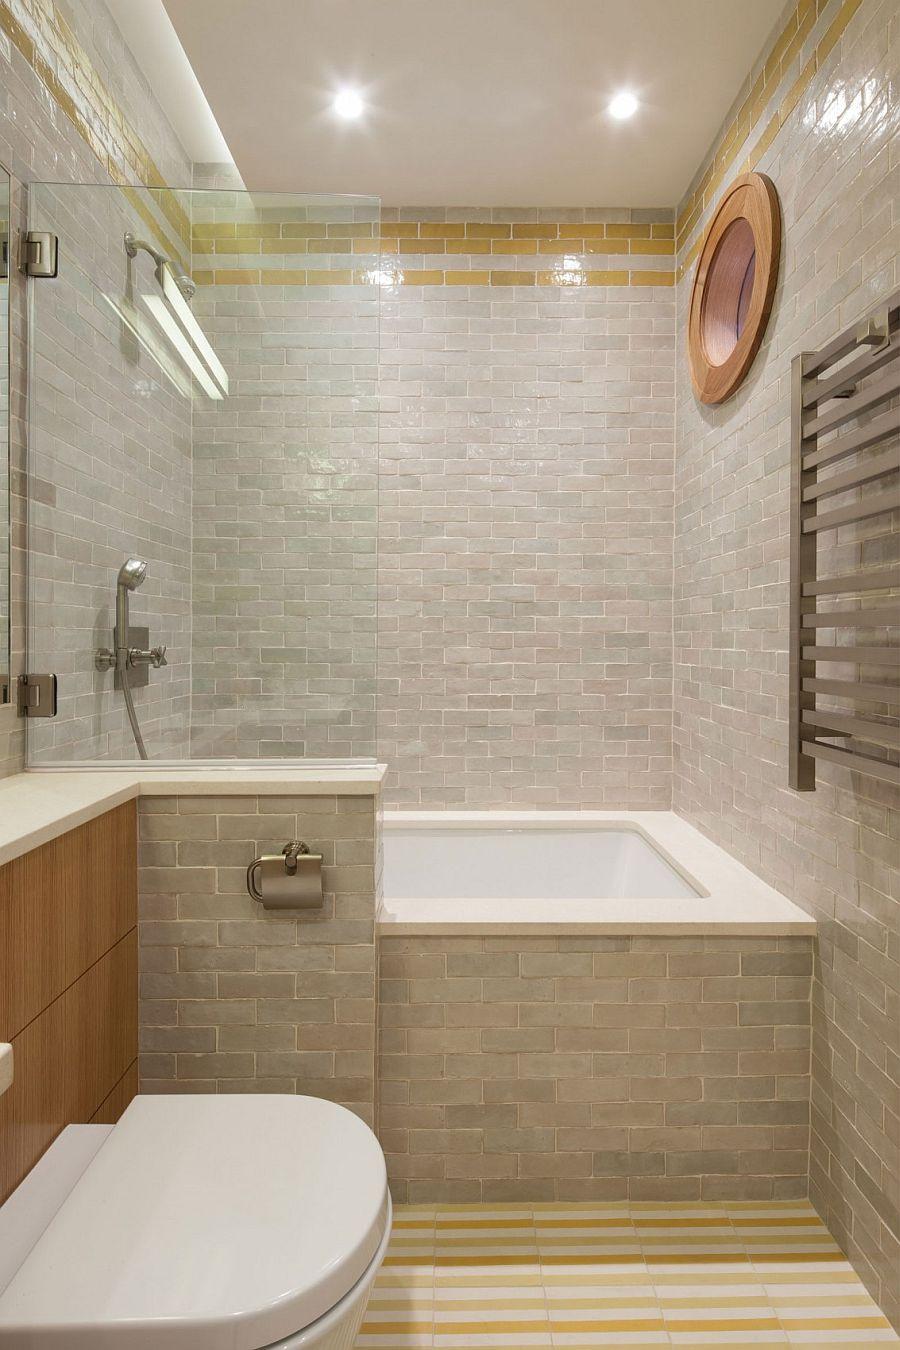 Stylish bathroom has a more traditional vibe